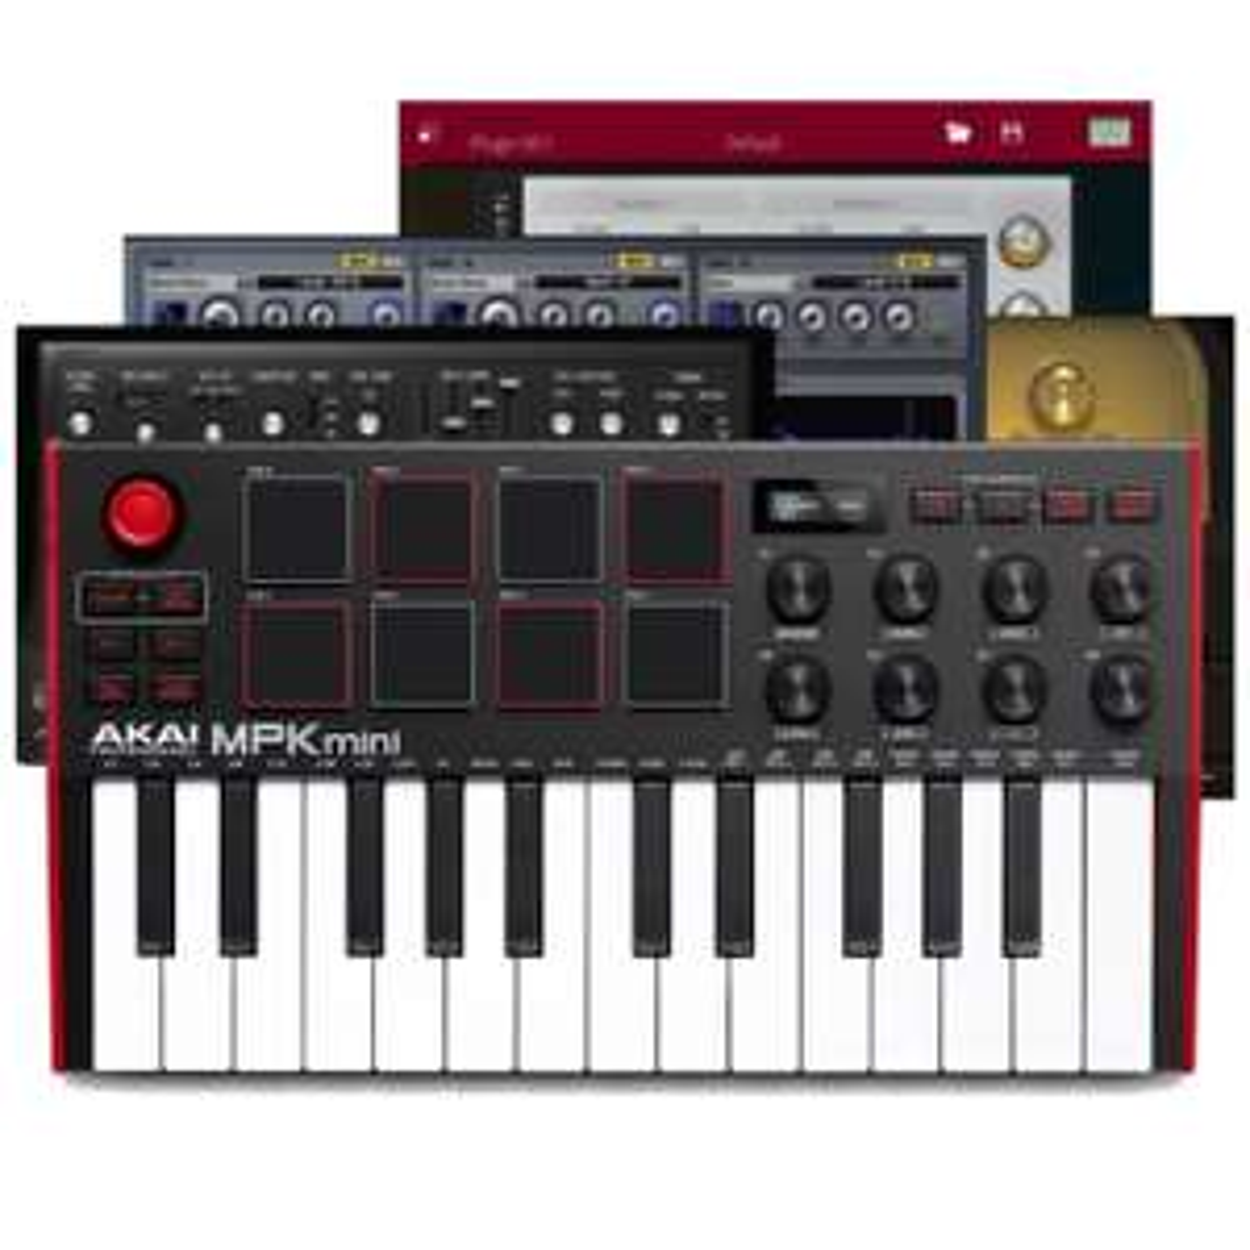 AKAI PROFESSIONAL MPK Mini MK3 £81 @ Music matter